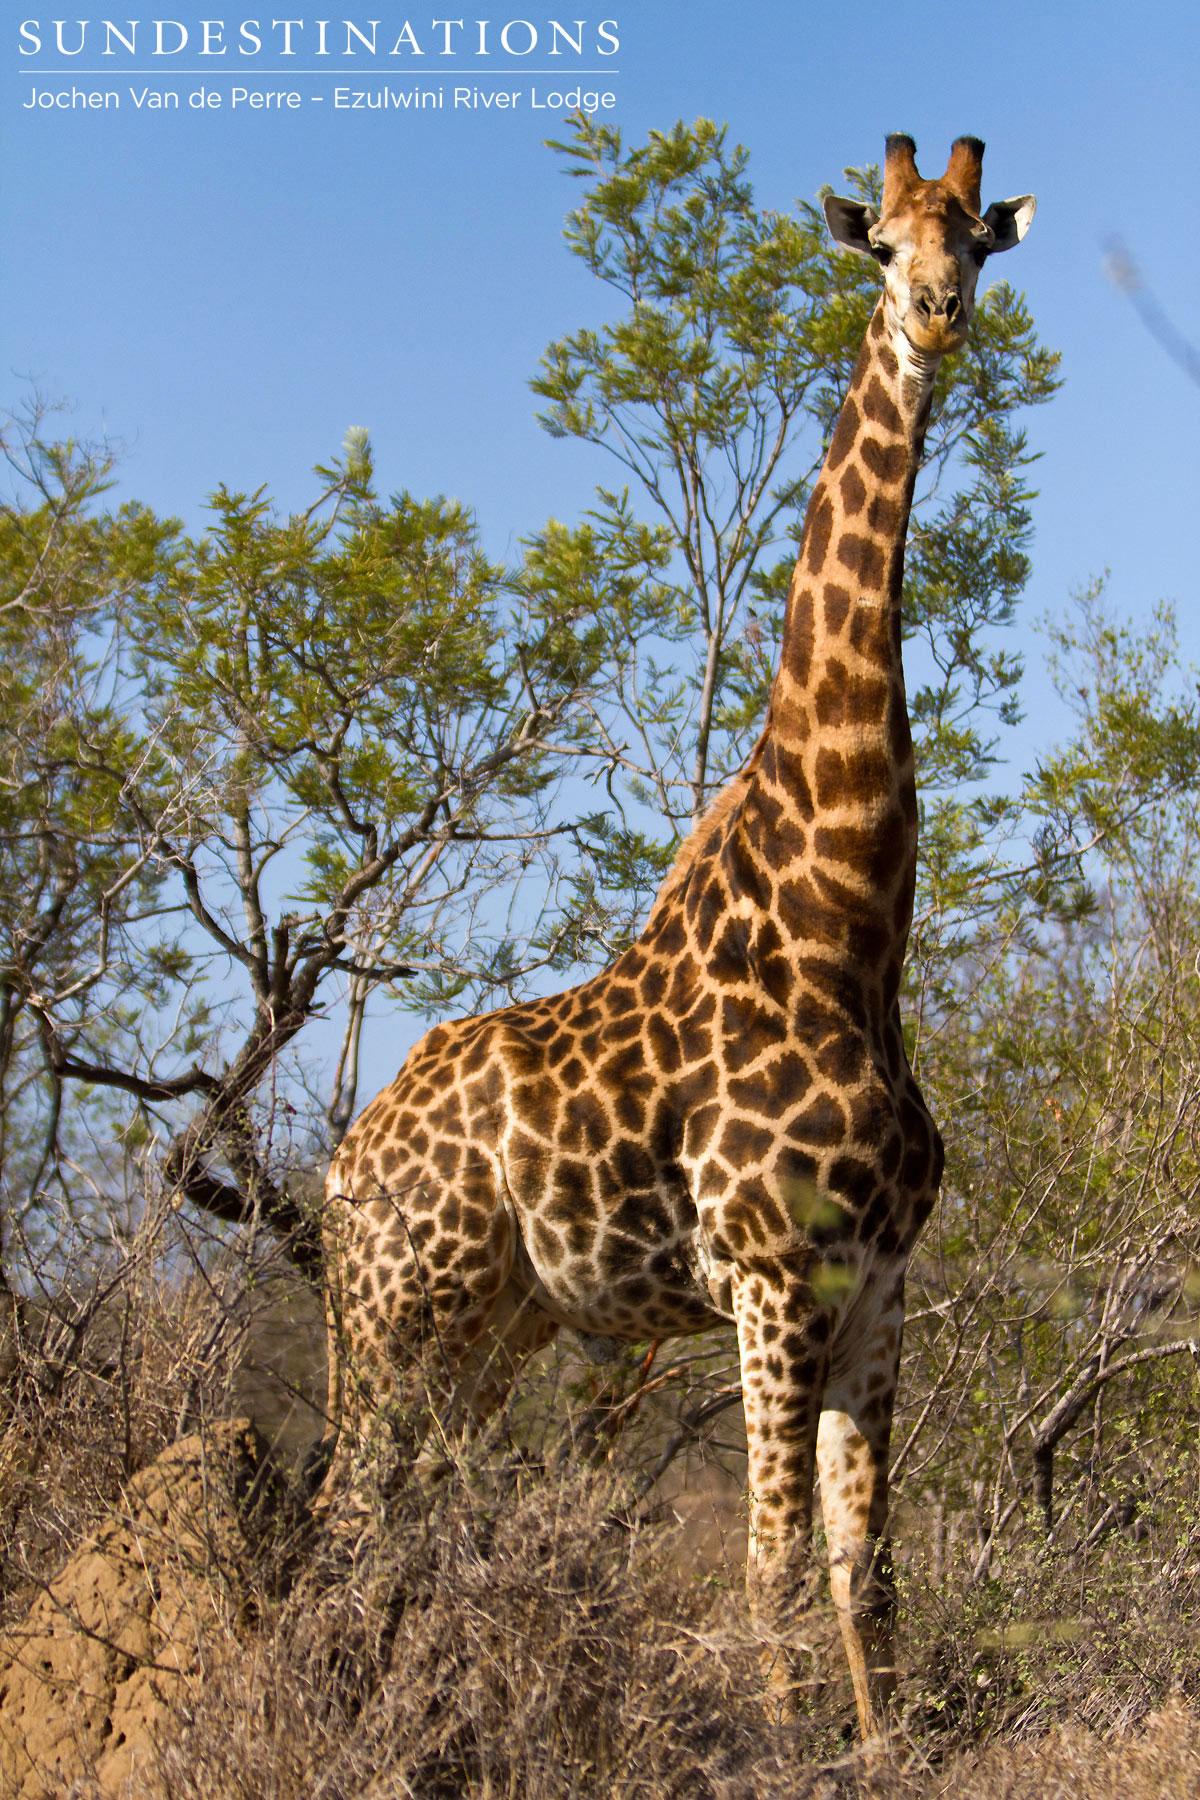 oxpecker and grazing herbivores relationship goals